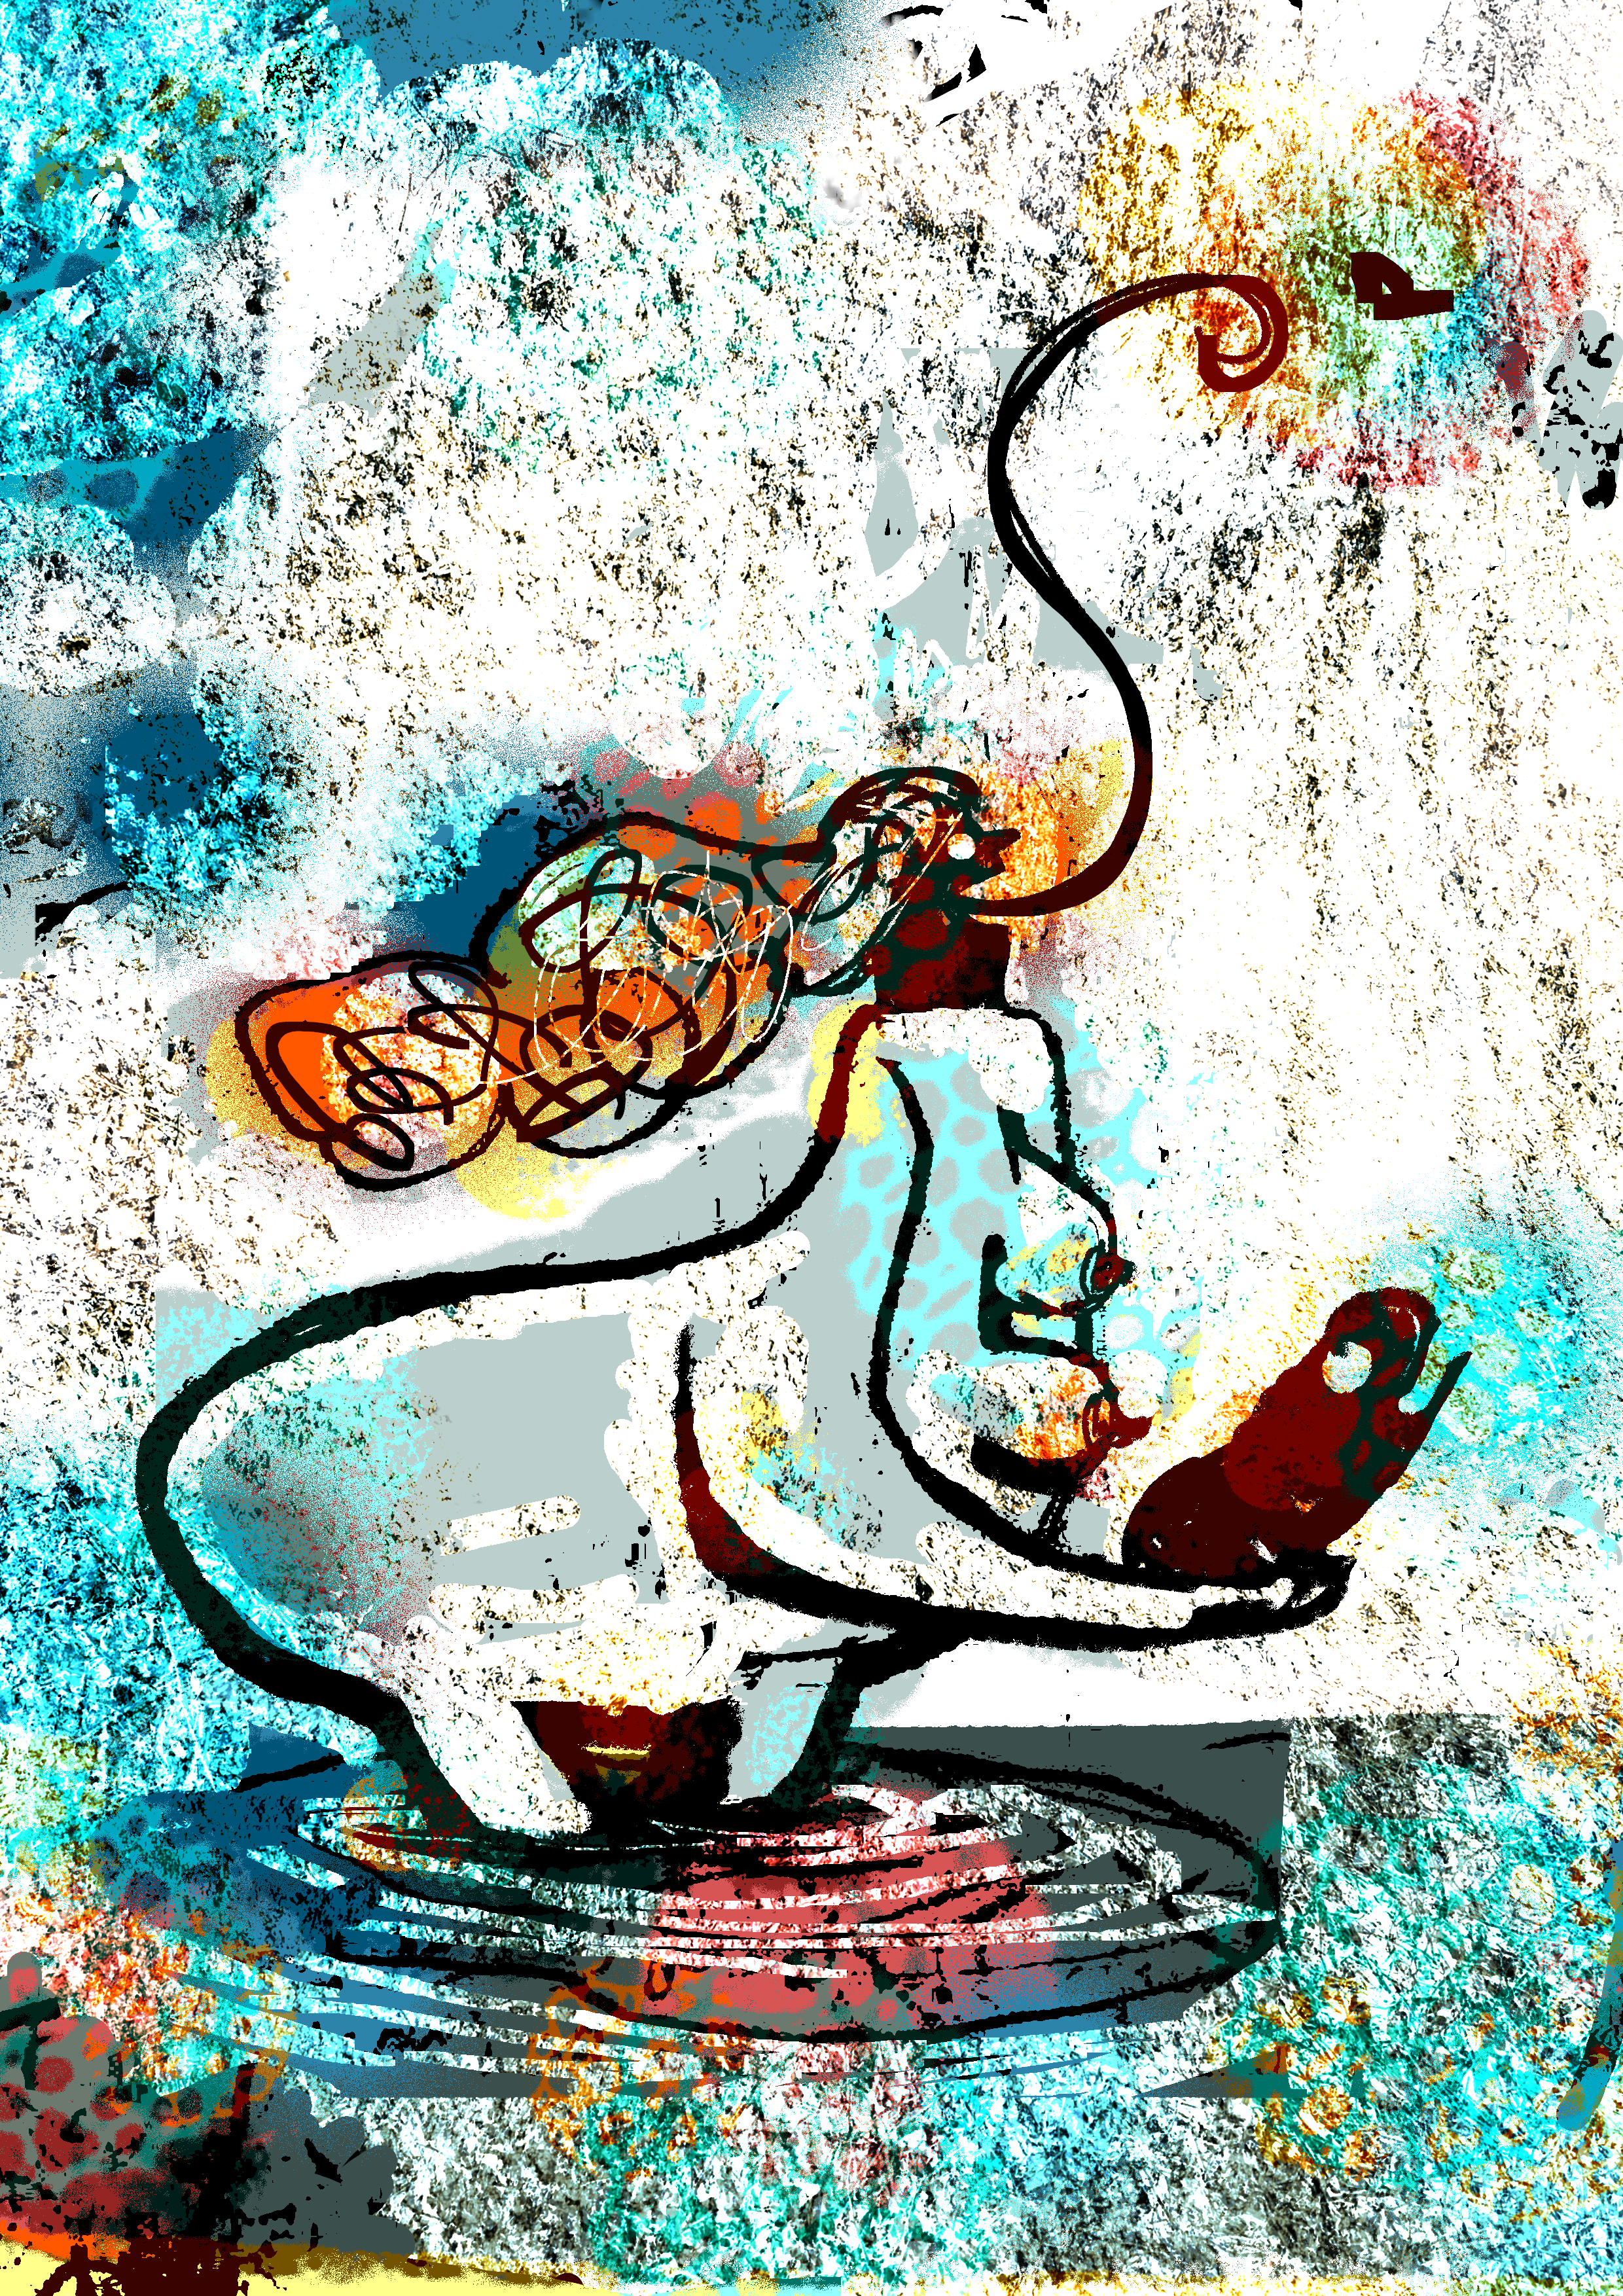 beatrijswind.org/poskuns32019